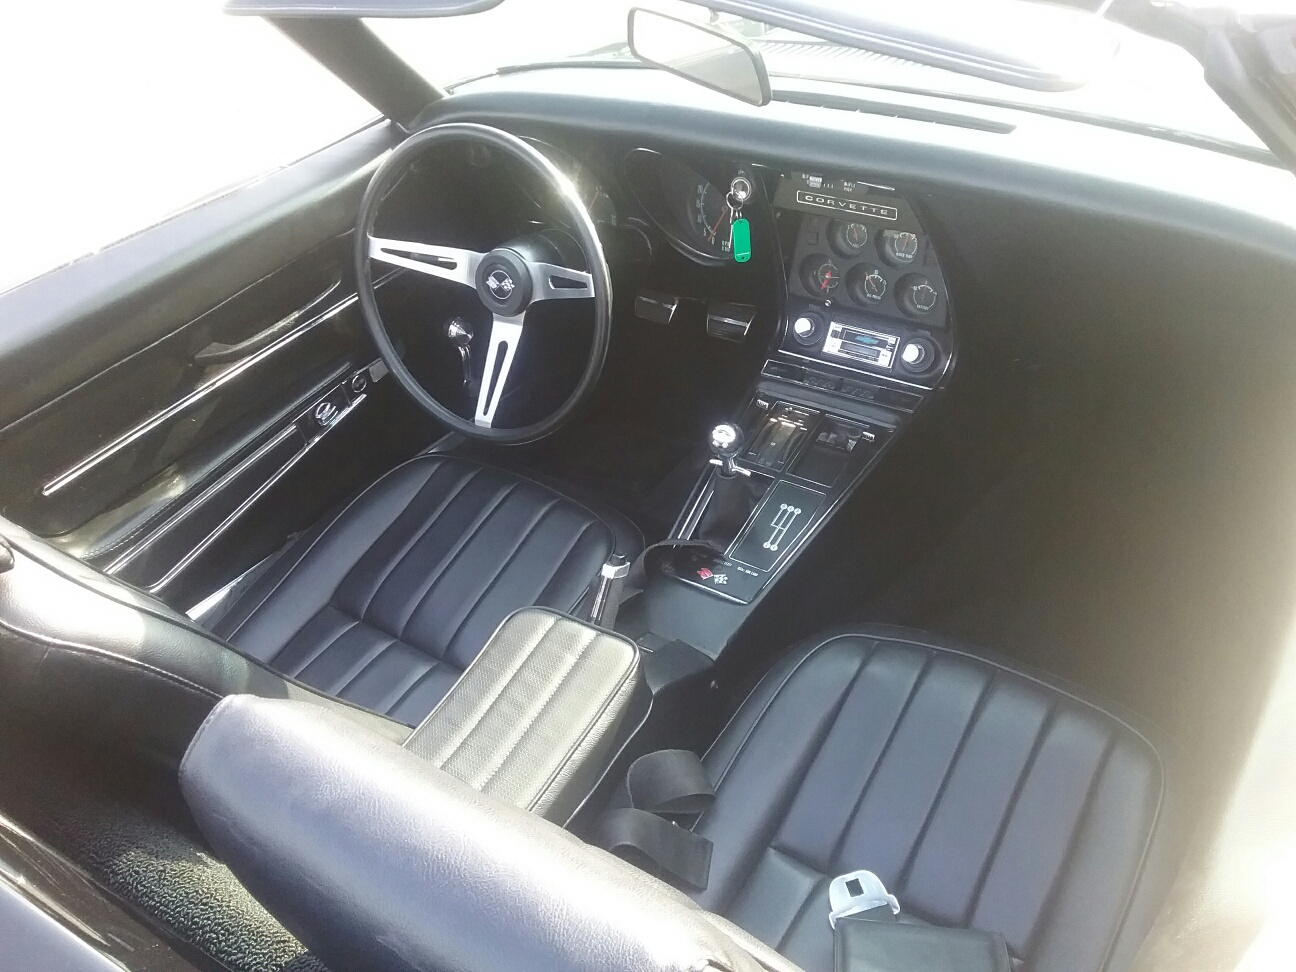 Corvette 1968 cabriolet 427 ci 7